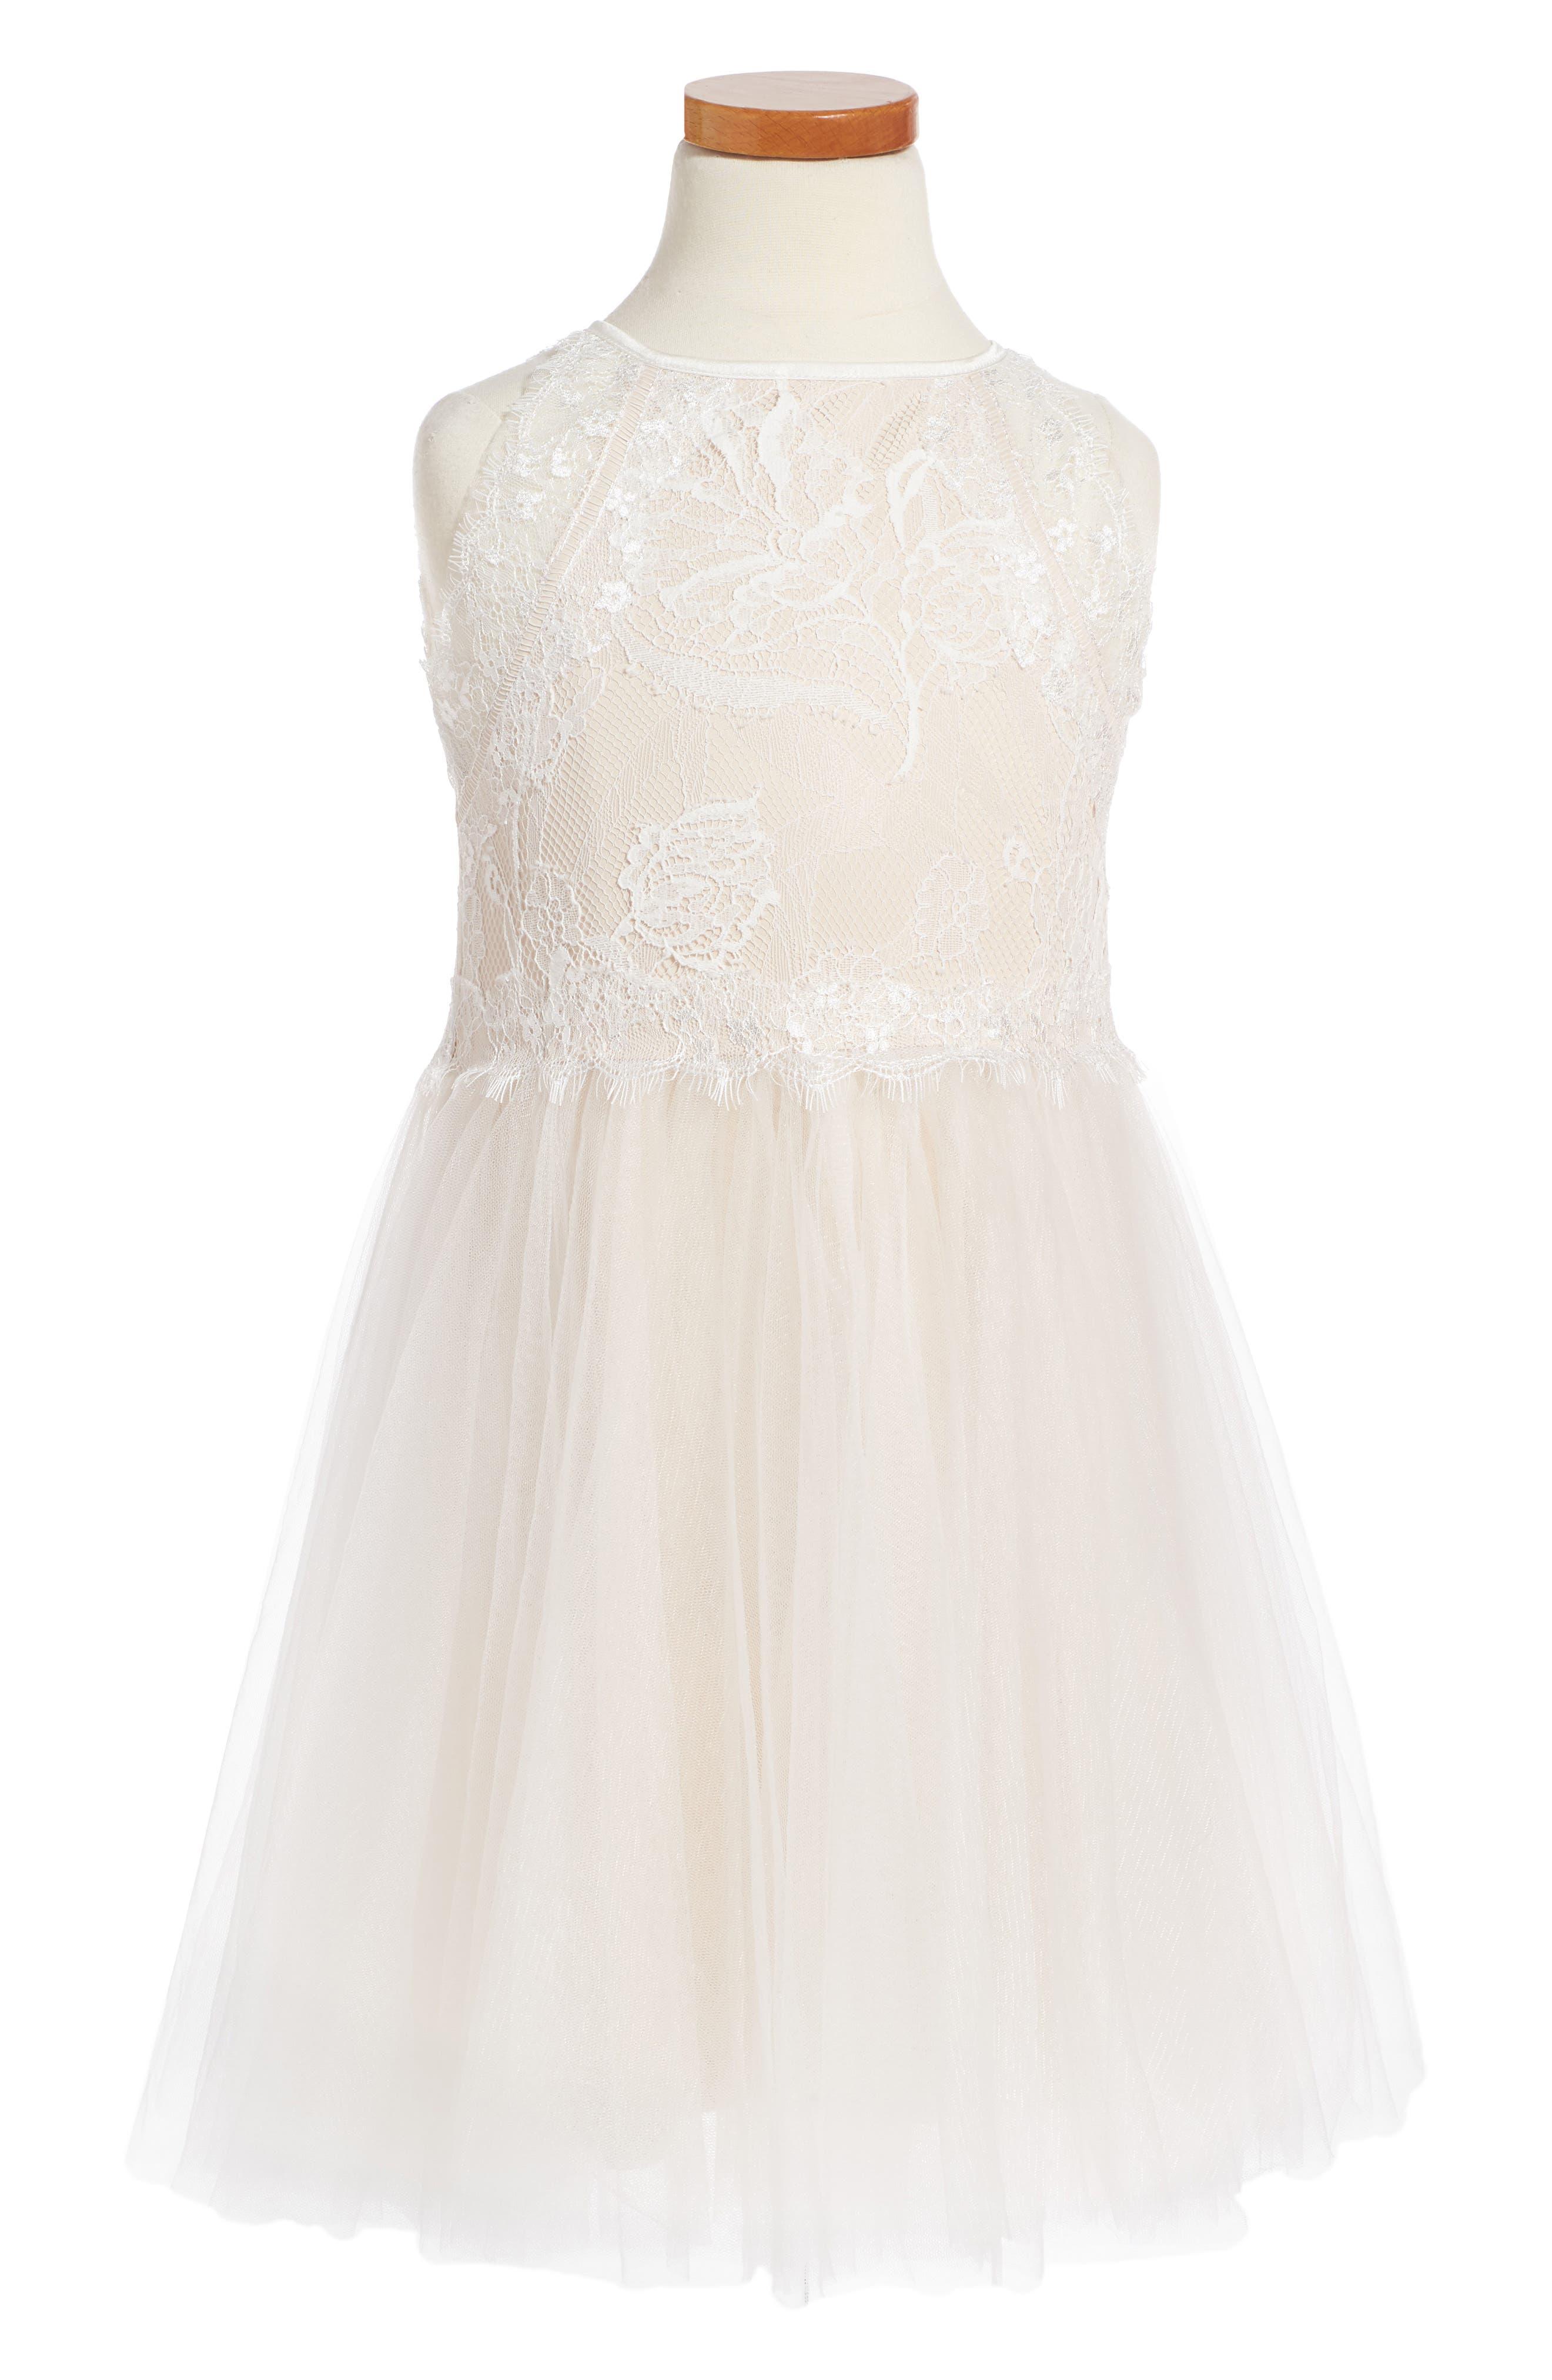 Sleeveless Lace Dress,                         Main,                         color, 900